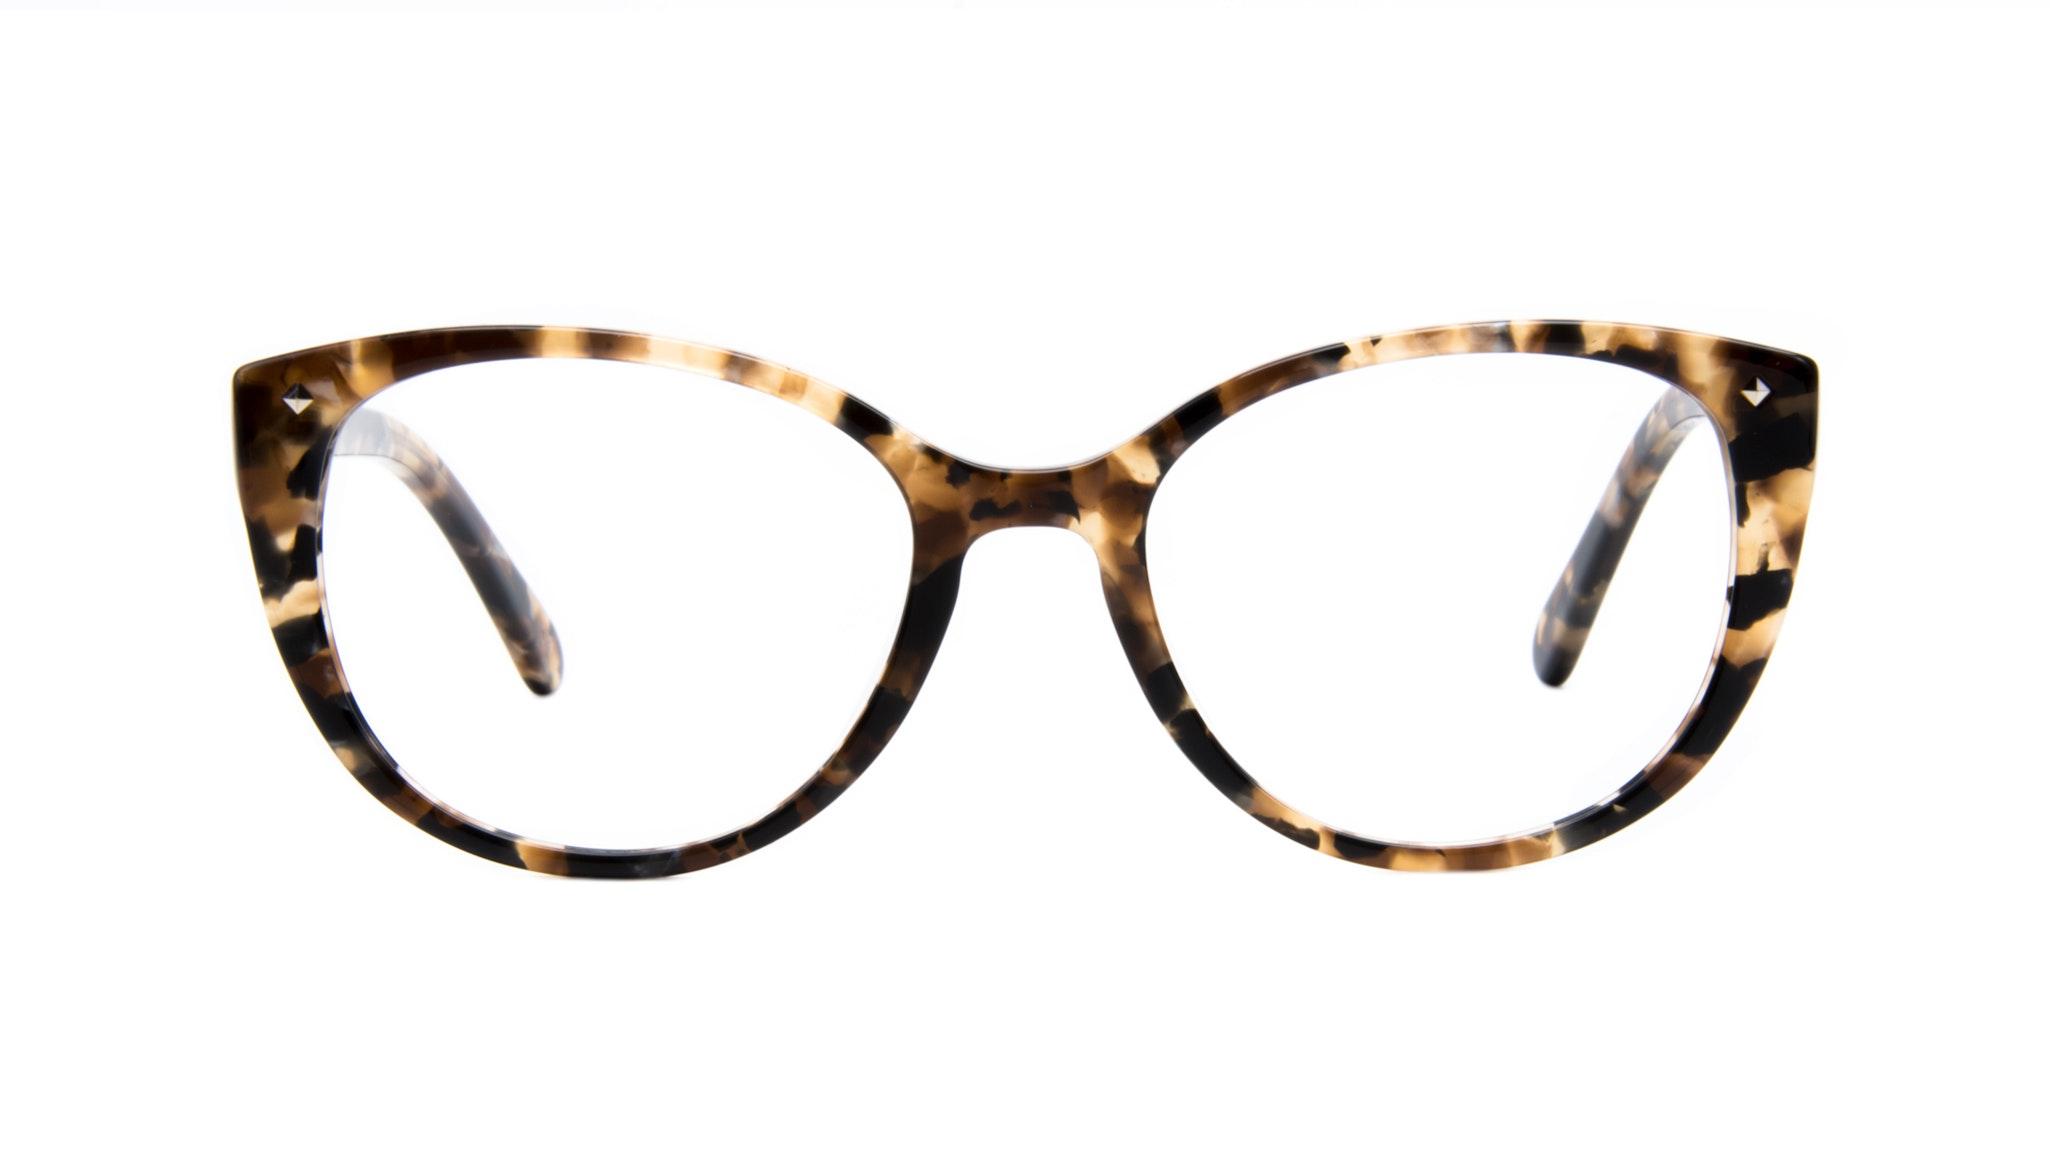 Affordable Fashion Glasses Cat Eye Eyeglasses Women Mist Tortoise Front